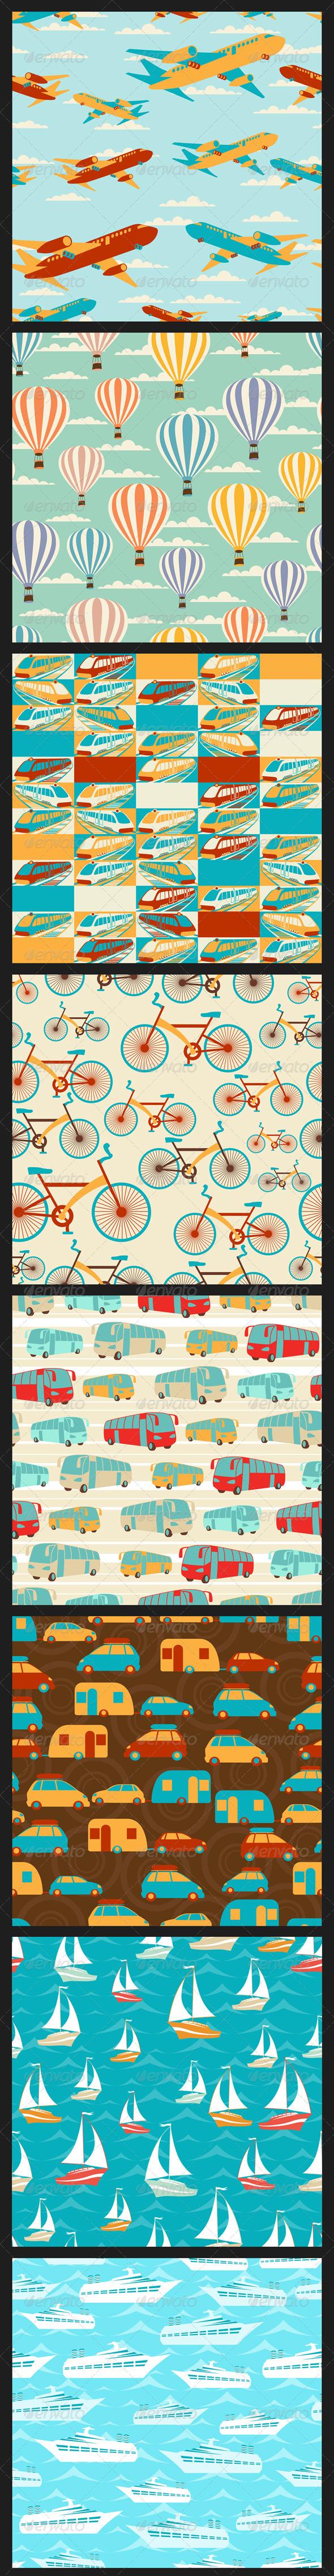 GraphicRiver Retro Travel Seamless Patterns 4770048